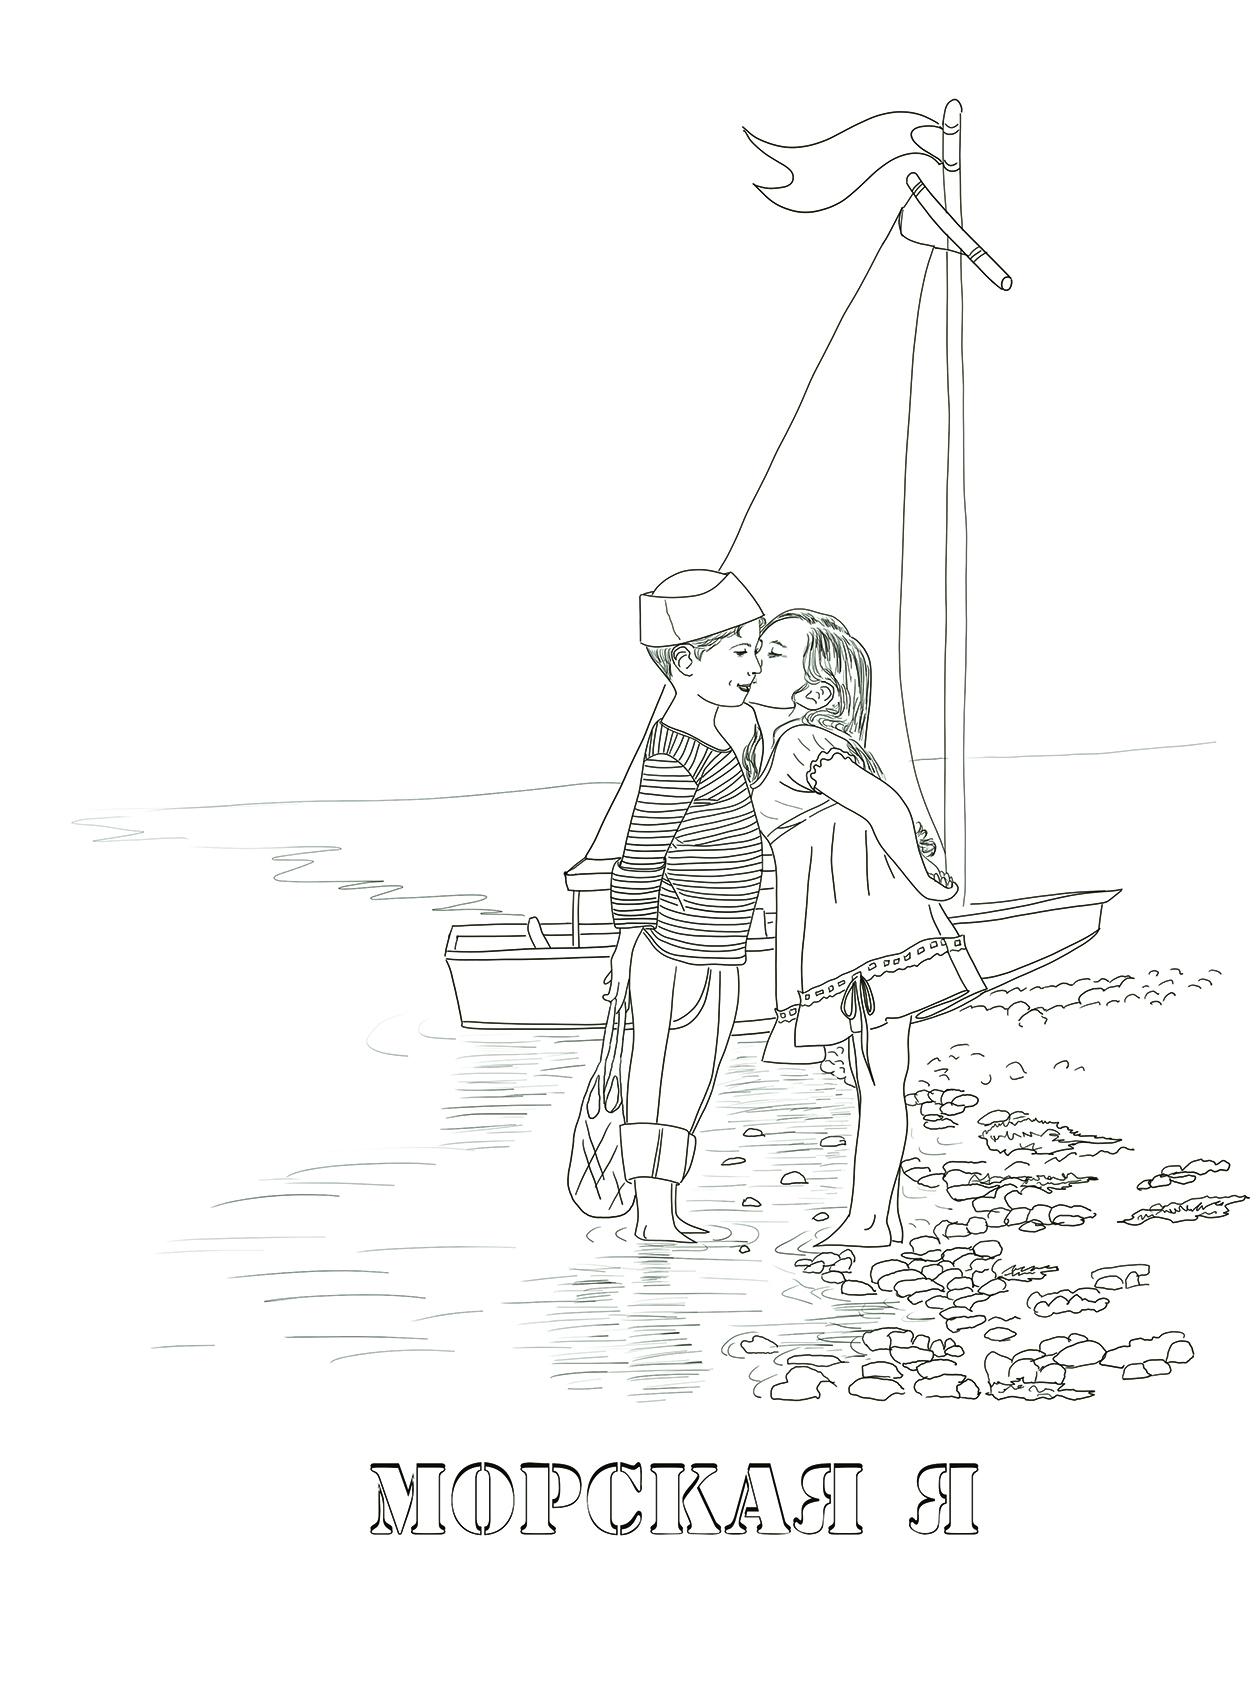 4. Морская я